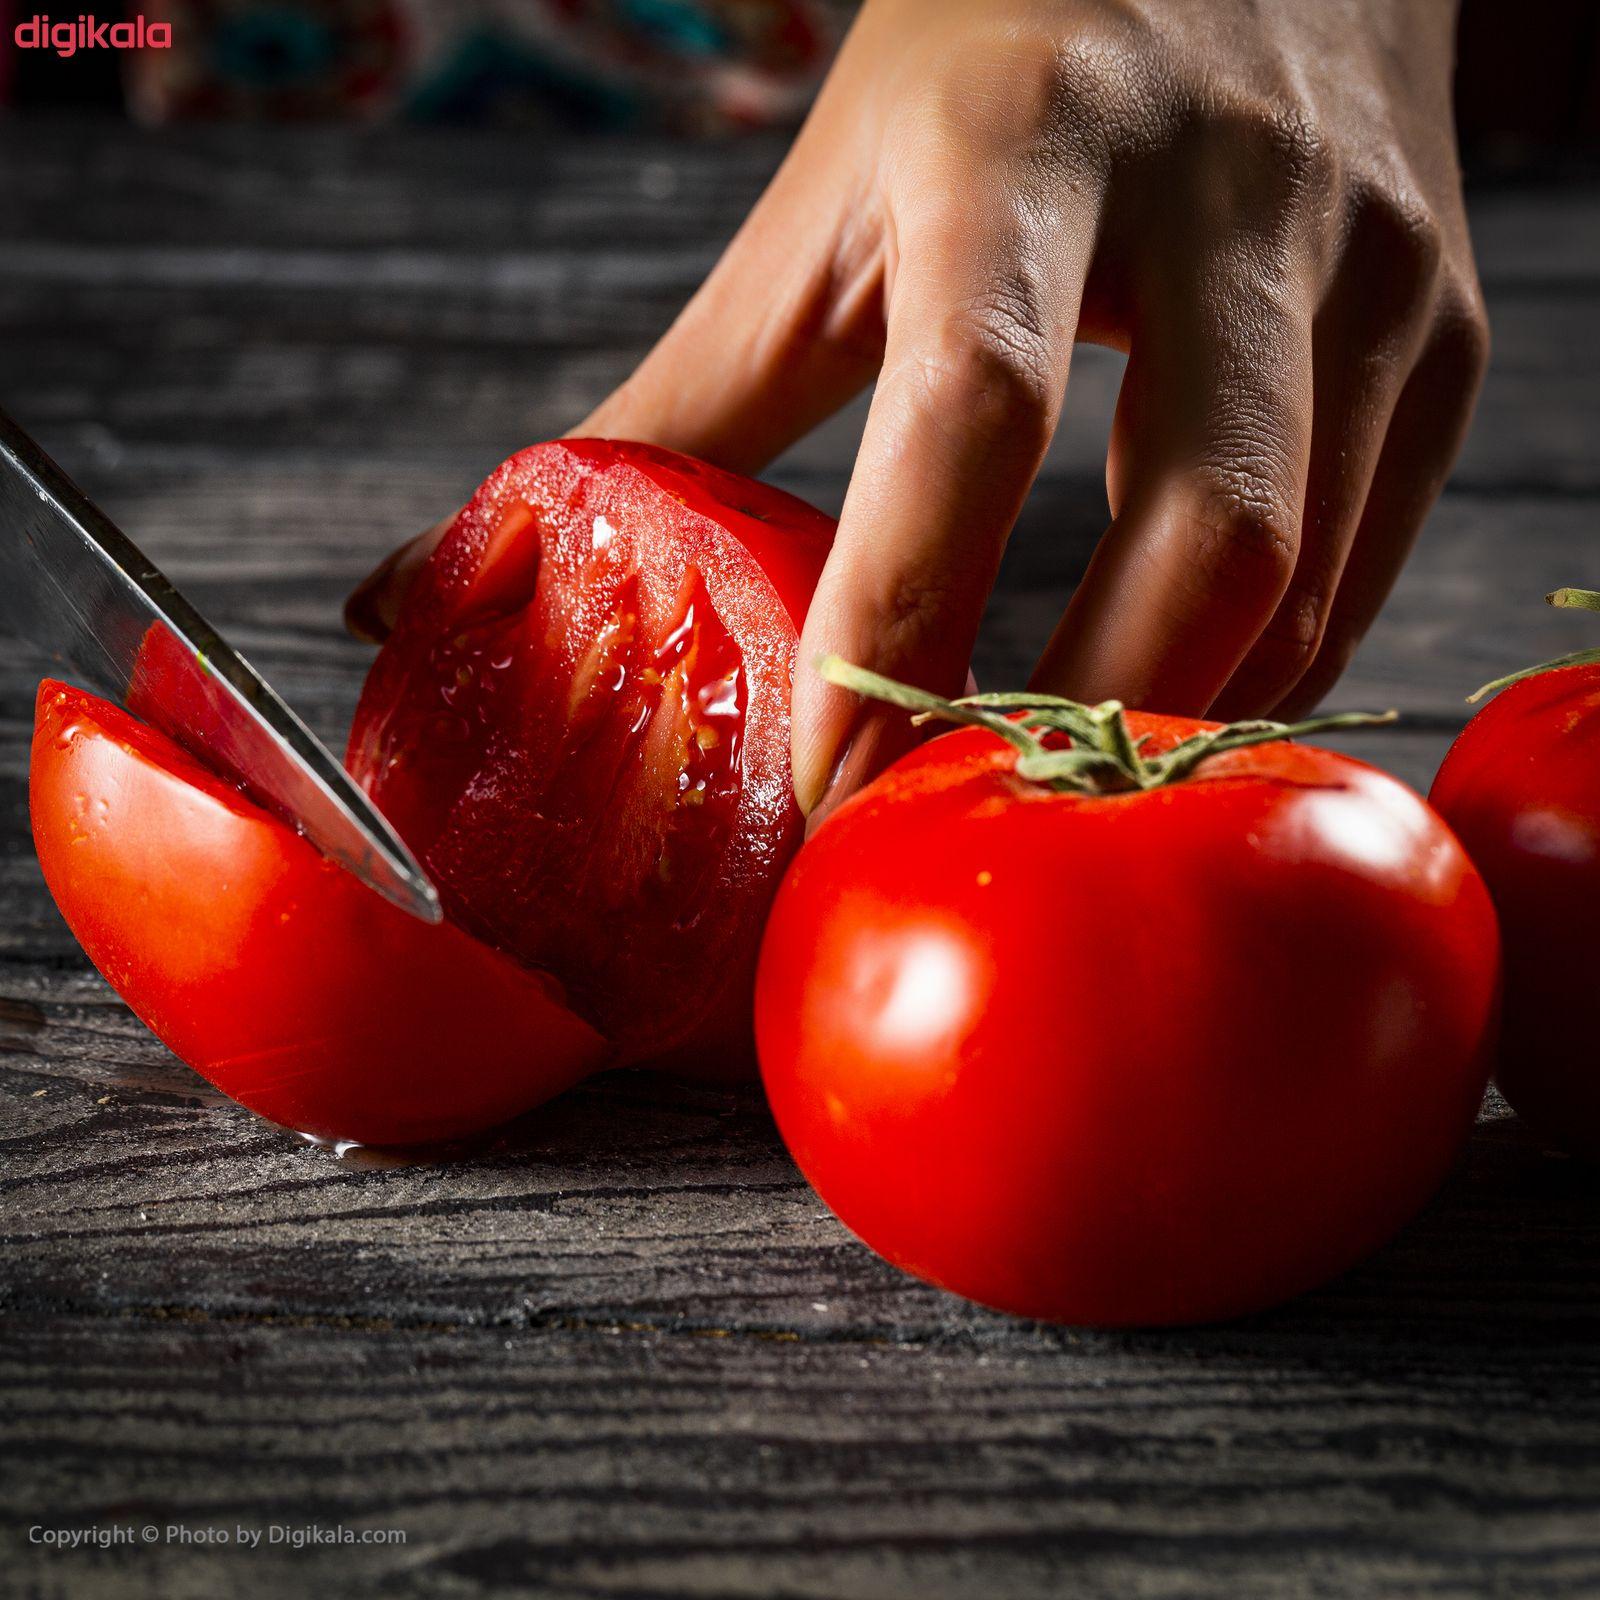 گوجه فرنگی بوته ای میوه پلاس - 1 کیلوگرم main 1 1